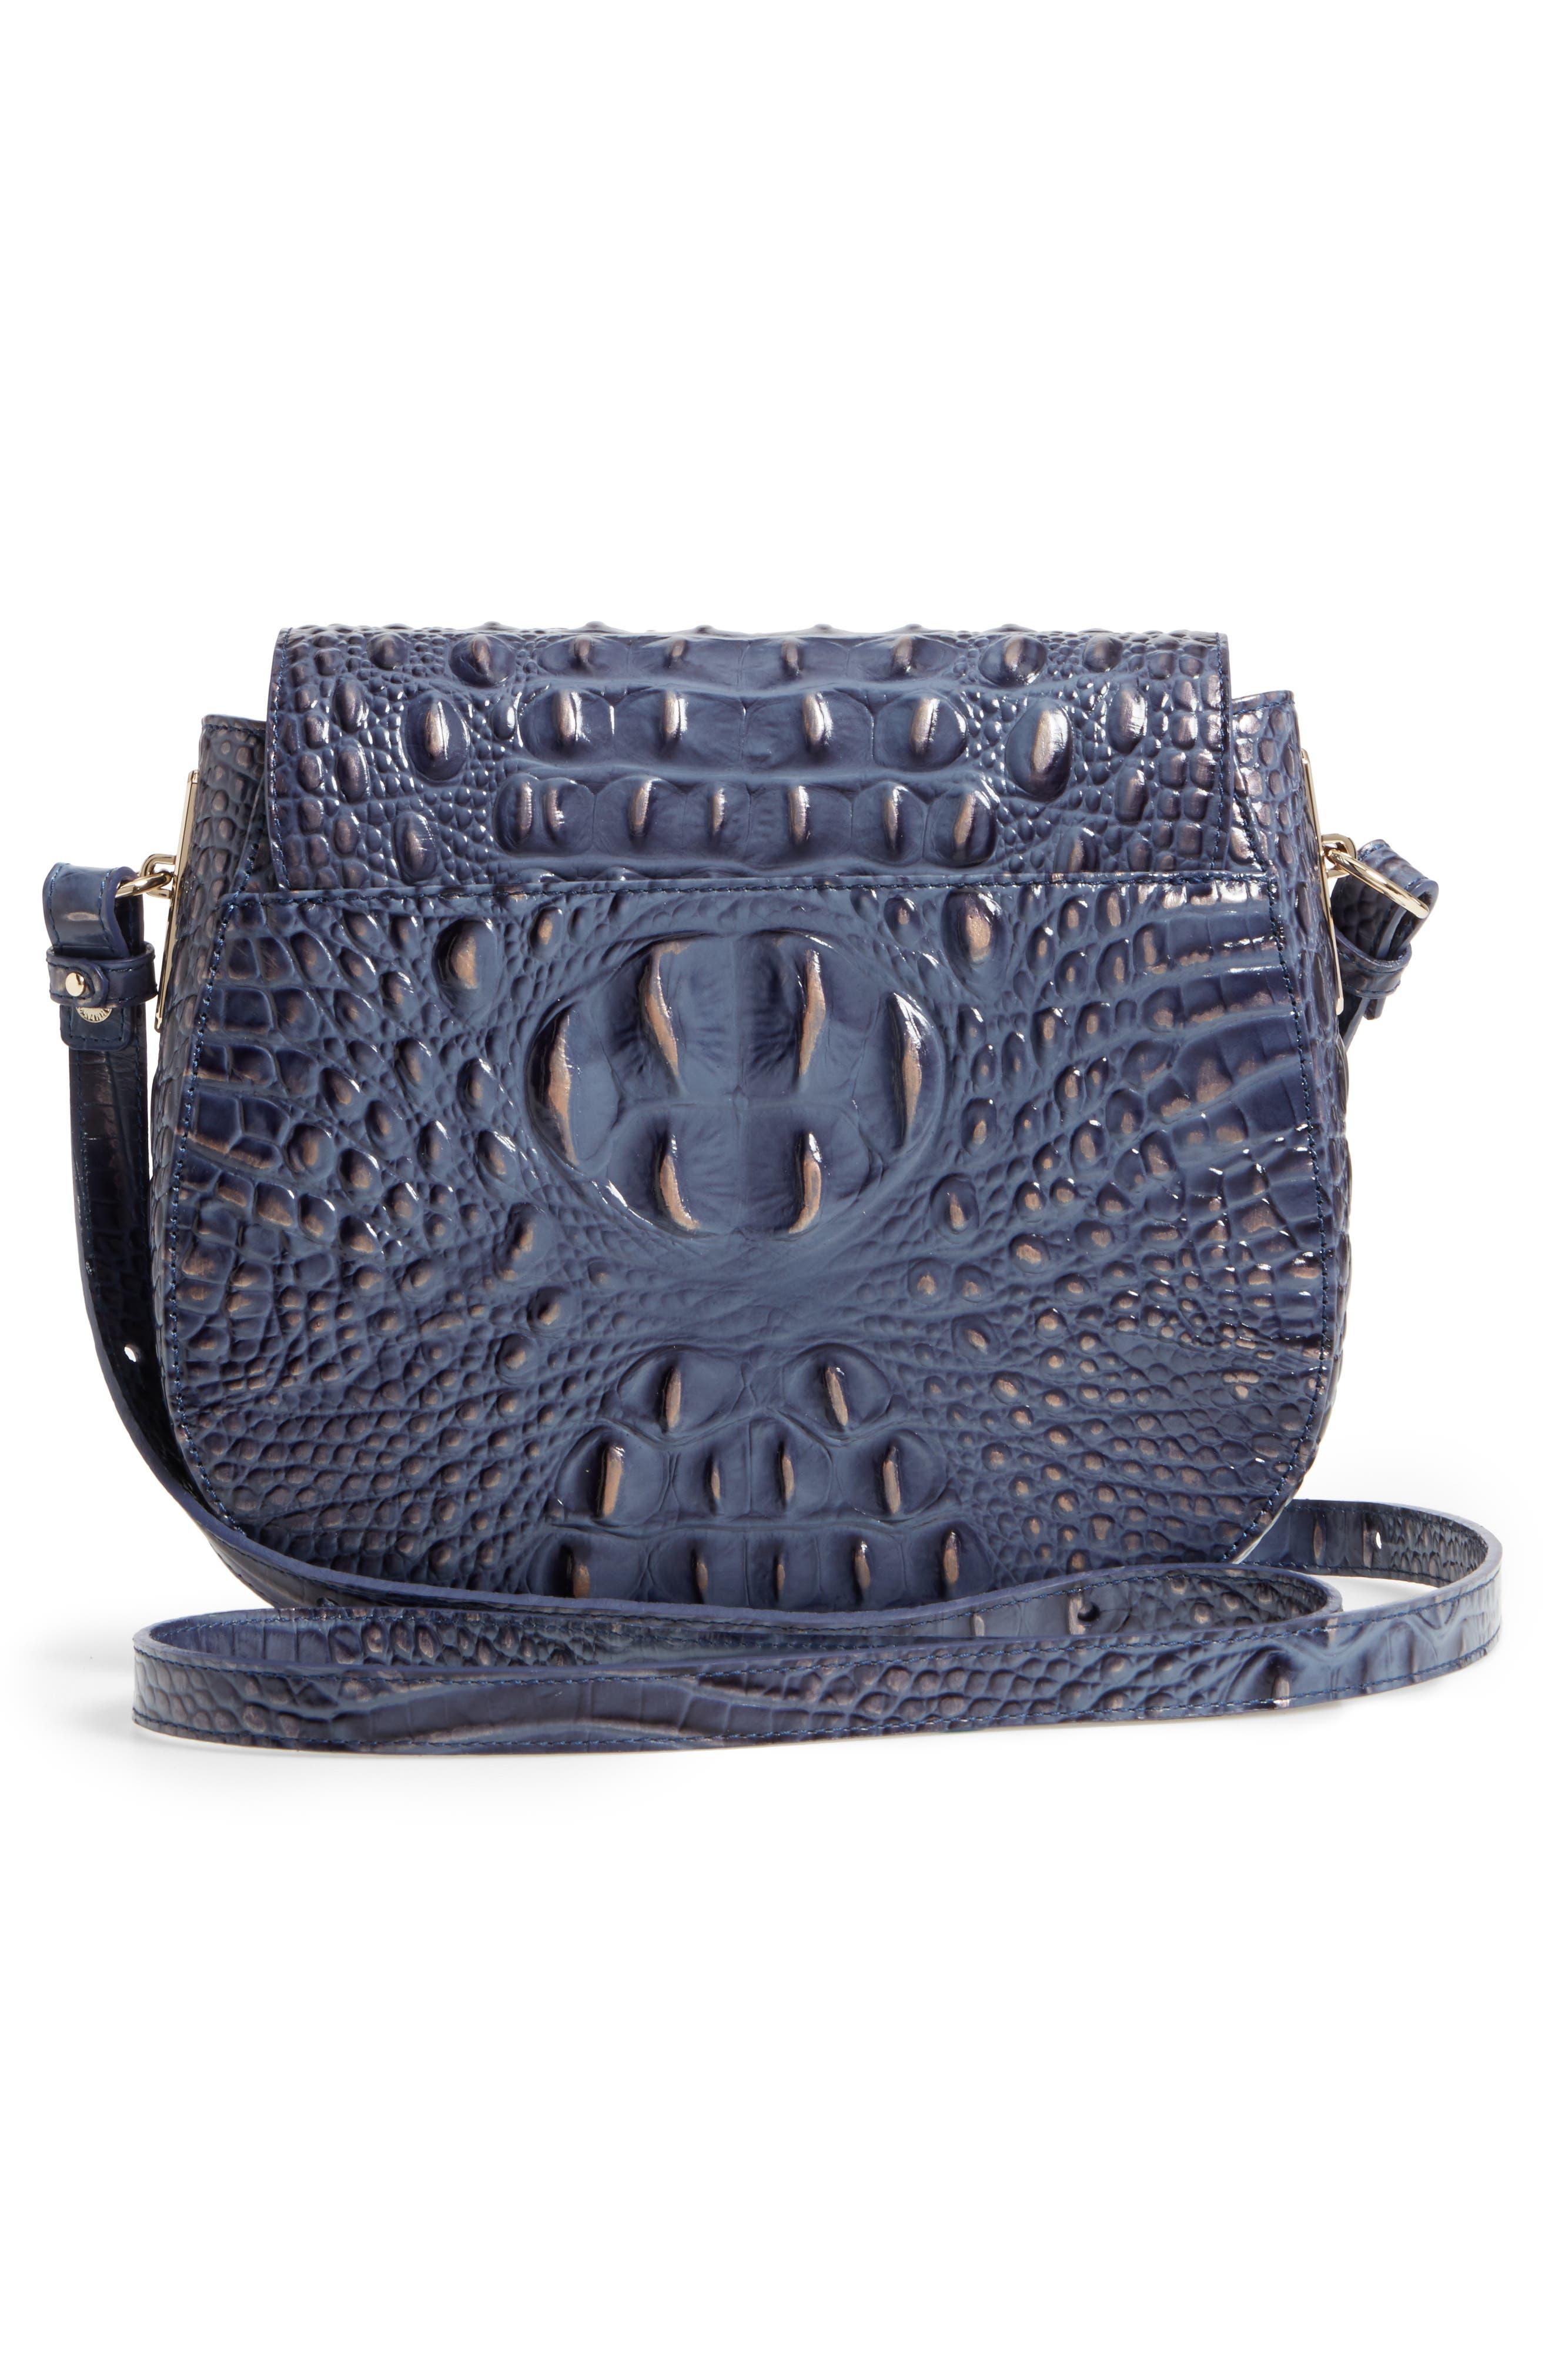 Melbourne - Lizzie Leather Crossbody Bag,                             Alternate thumbnail 14, color,